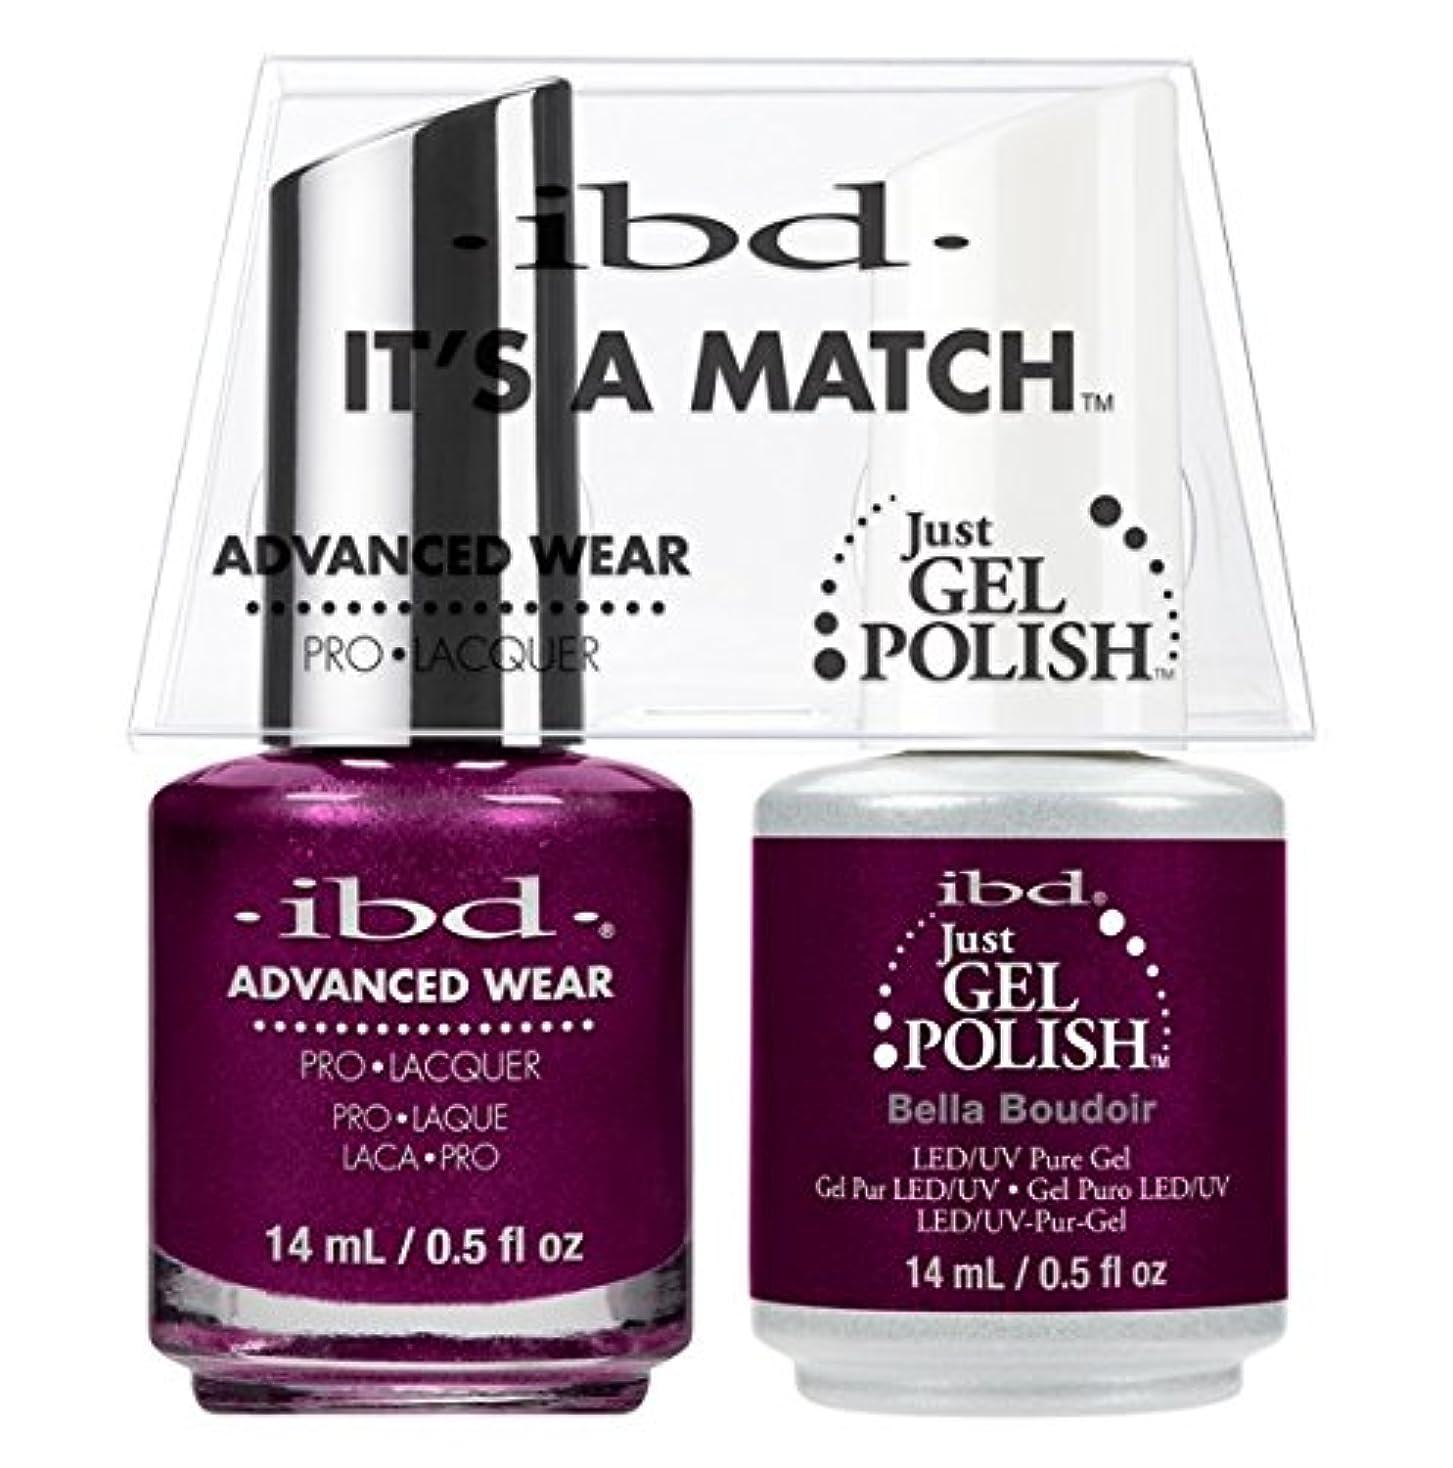 ibd - It's A Match -Duo Pack- Bella Boudoir - 14 mL / 0.5 oz Each